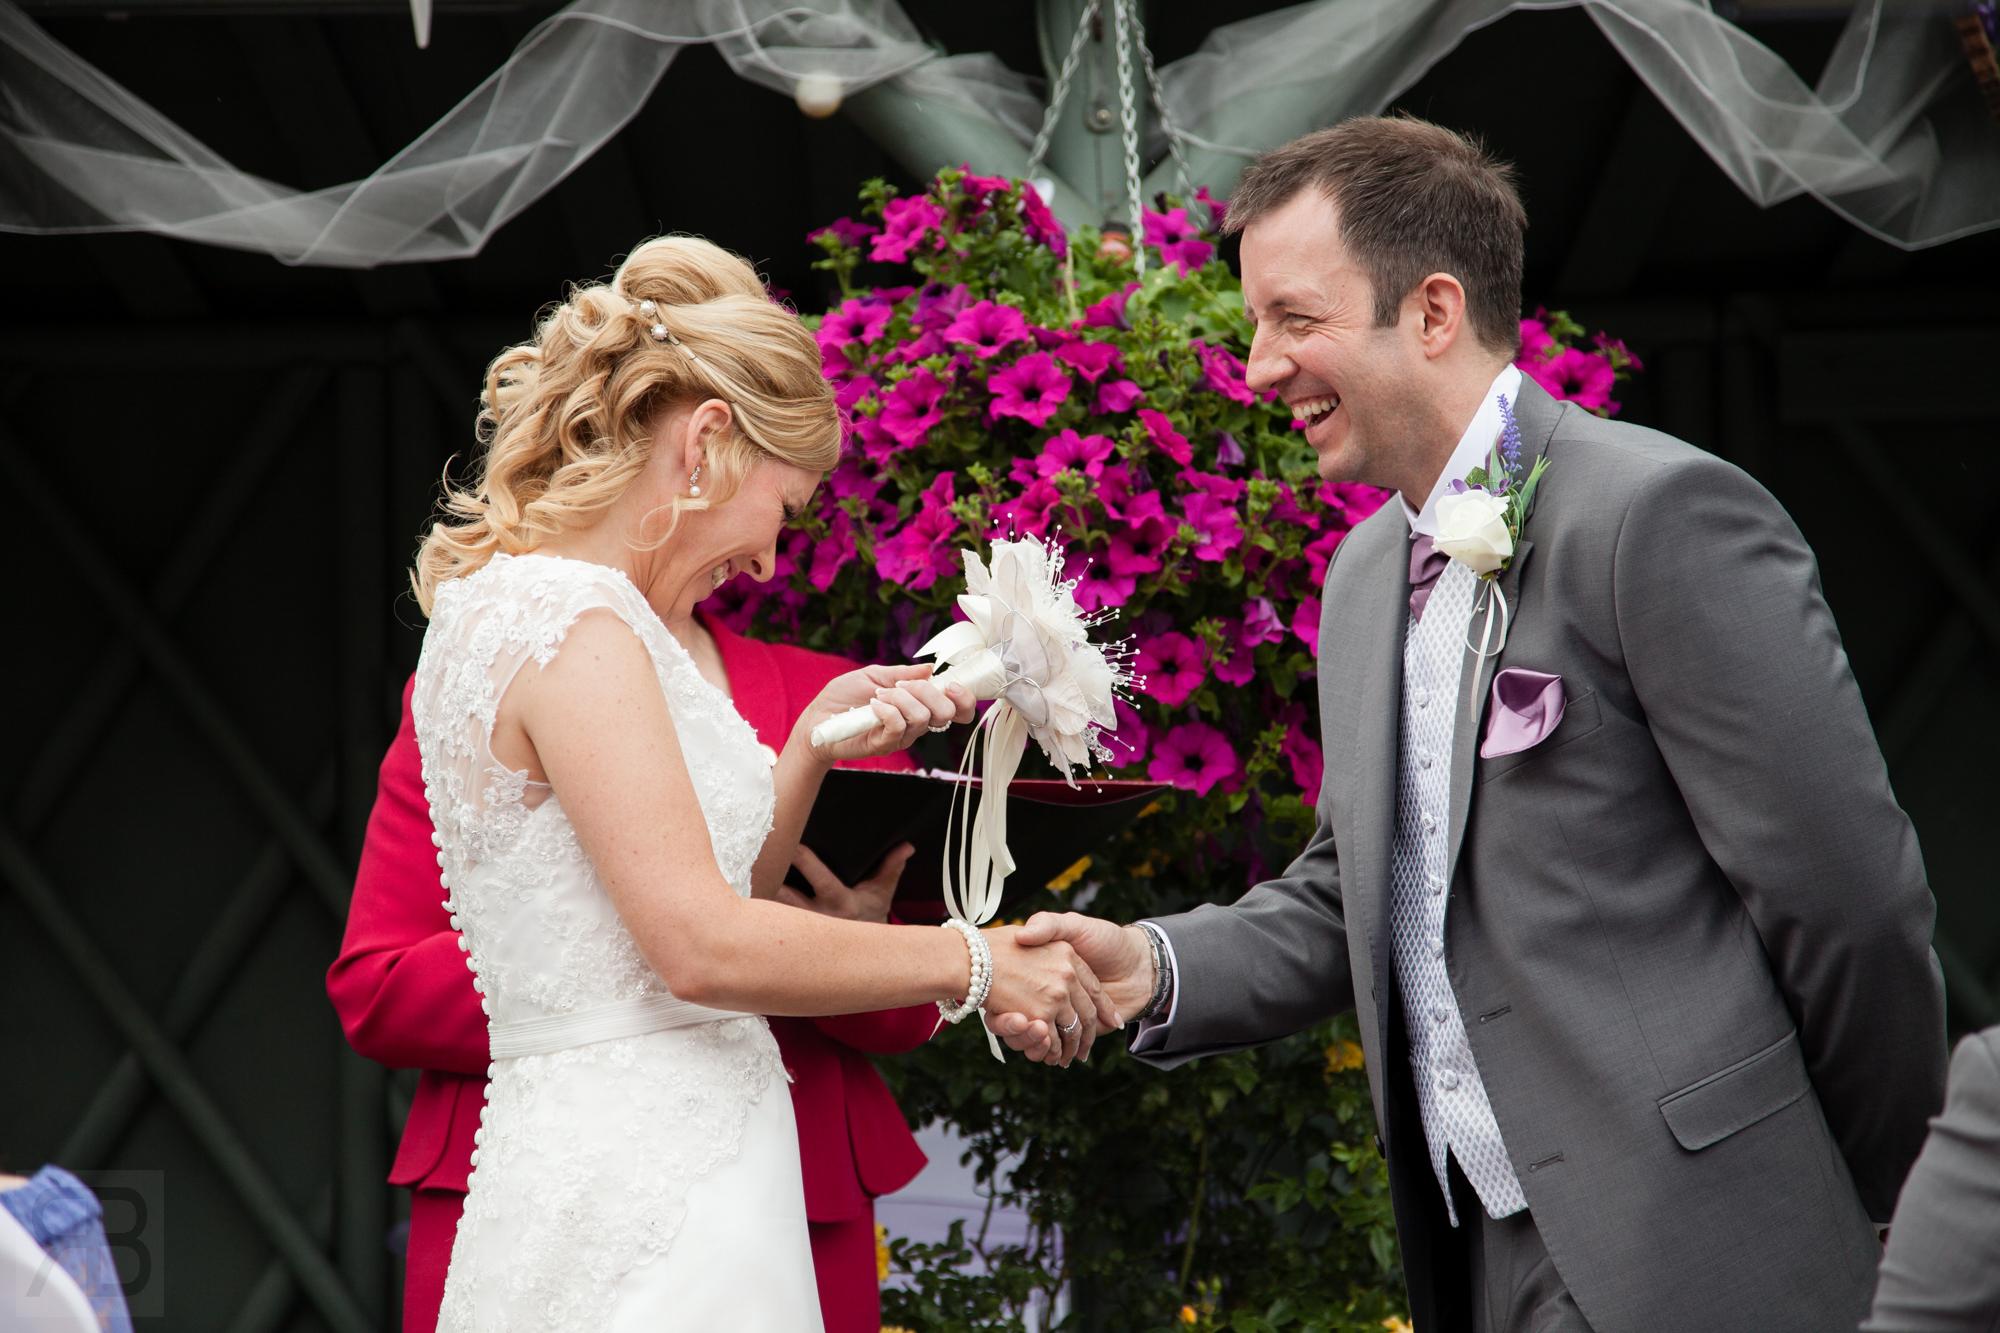 110715_LisaCraigJohnson_Wedding_5621213_WebWM.jpg